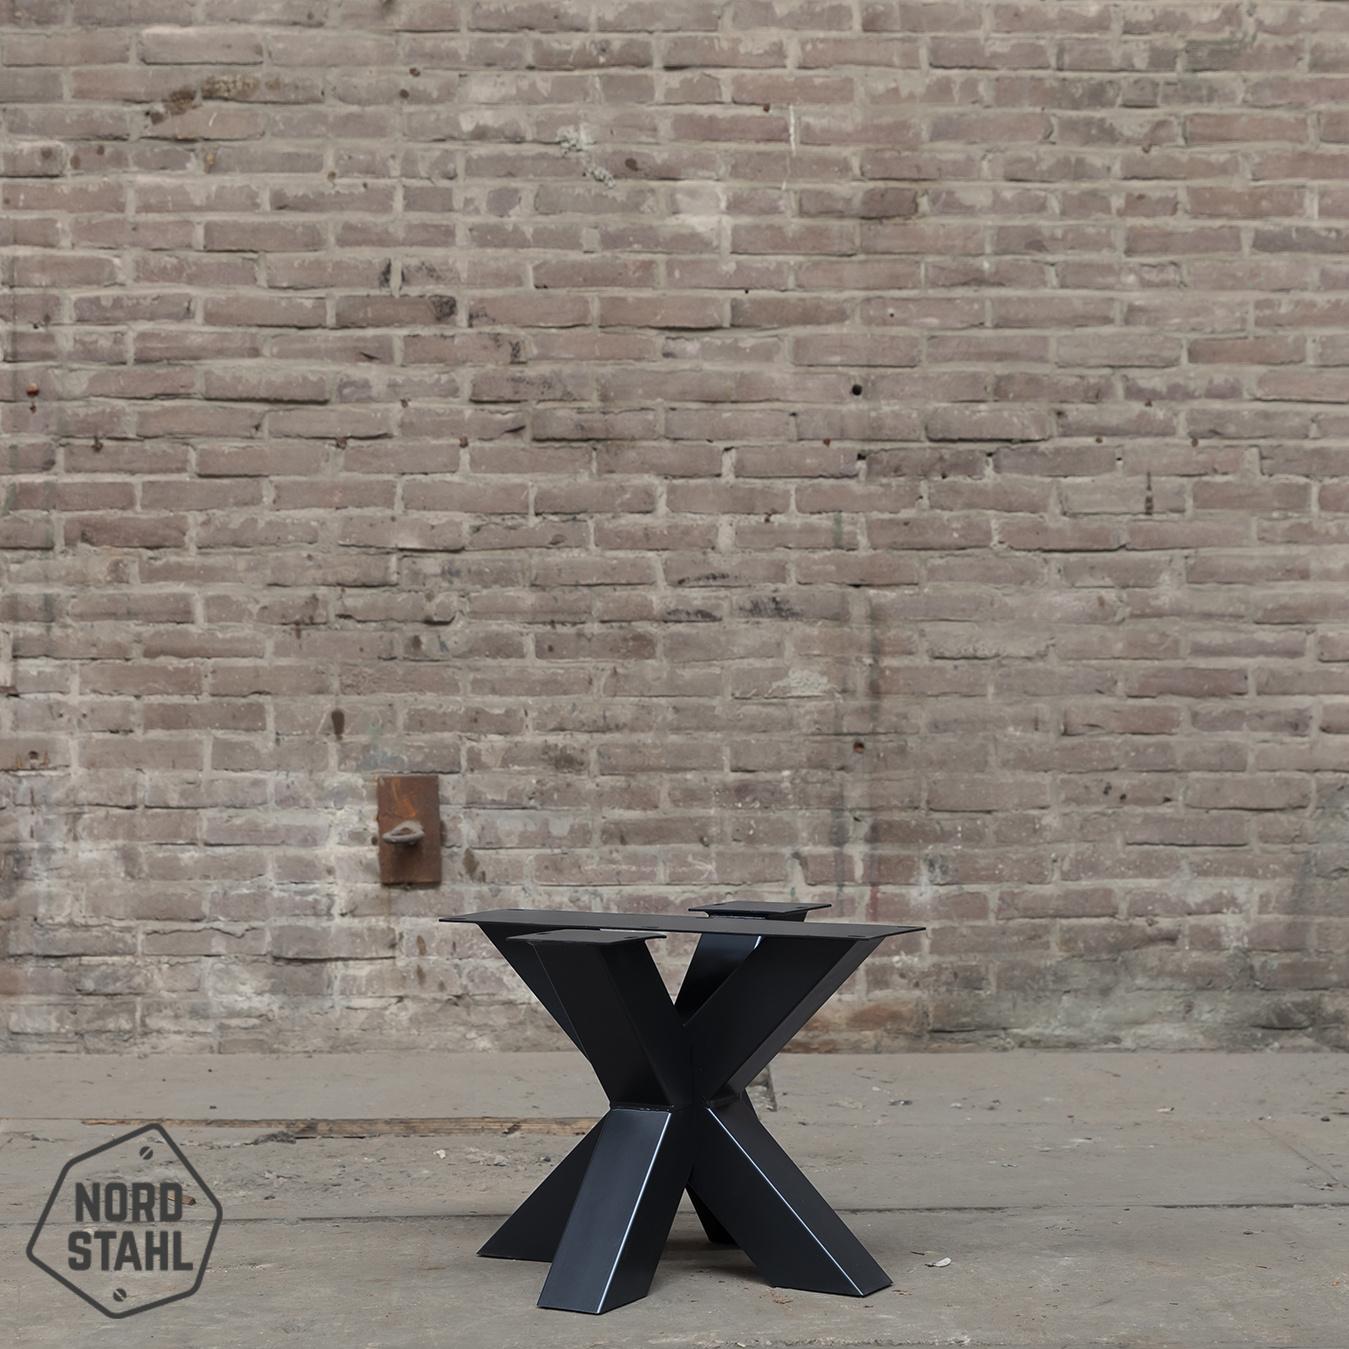 Nordstahl Double X coffee leg zwart stalen salontafelpoten 2